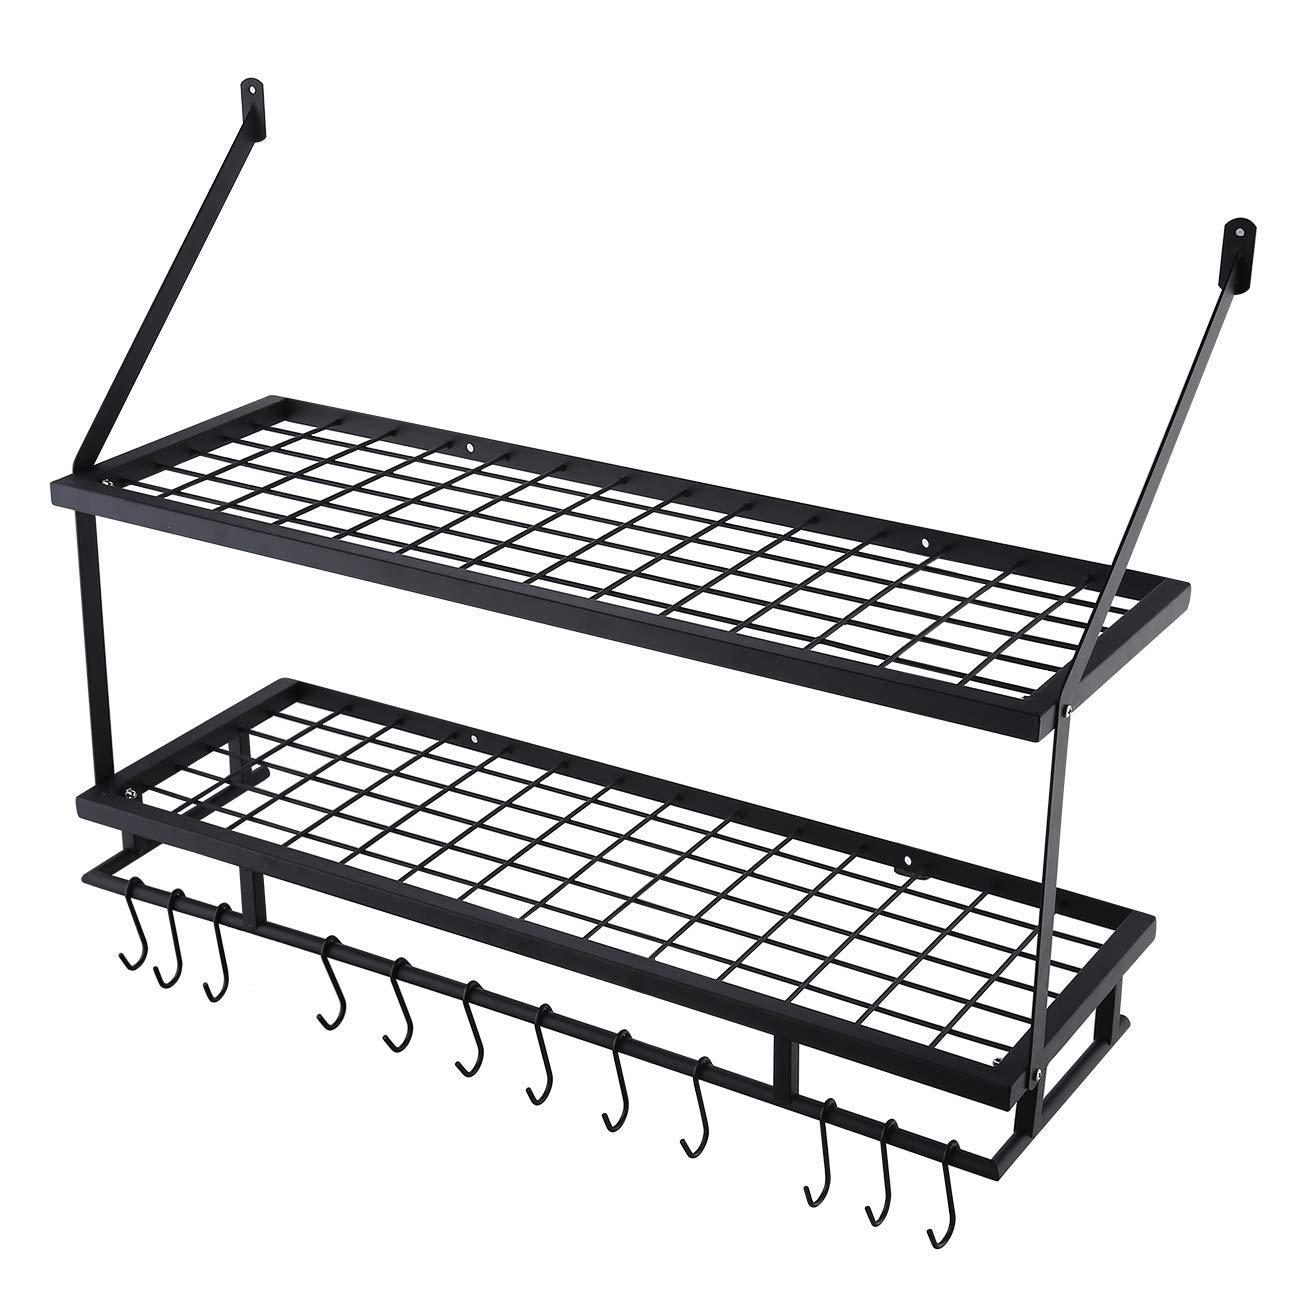 KES 24-Inch Kitchen Wall Mount Pot Pan Rack Wall Shelf With 10 Hooks Matte Black KUR215S60-BK